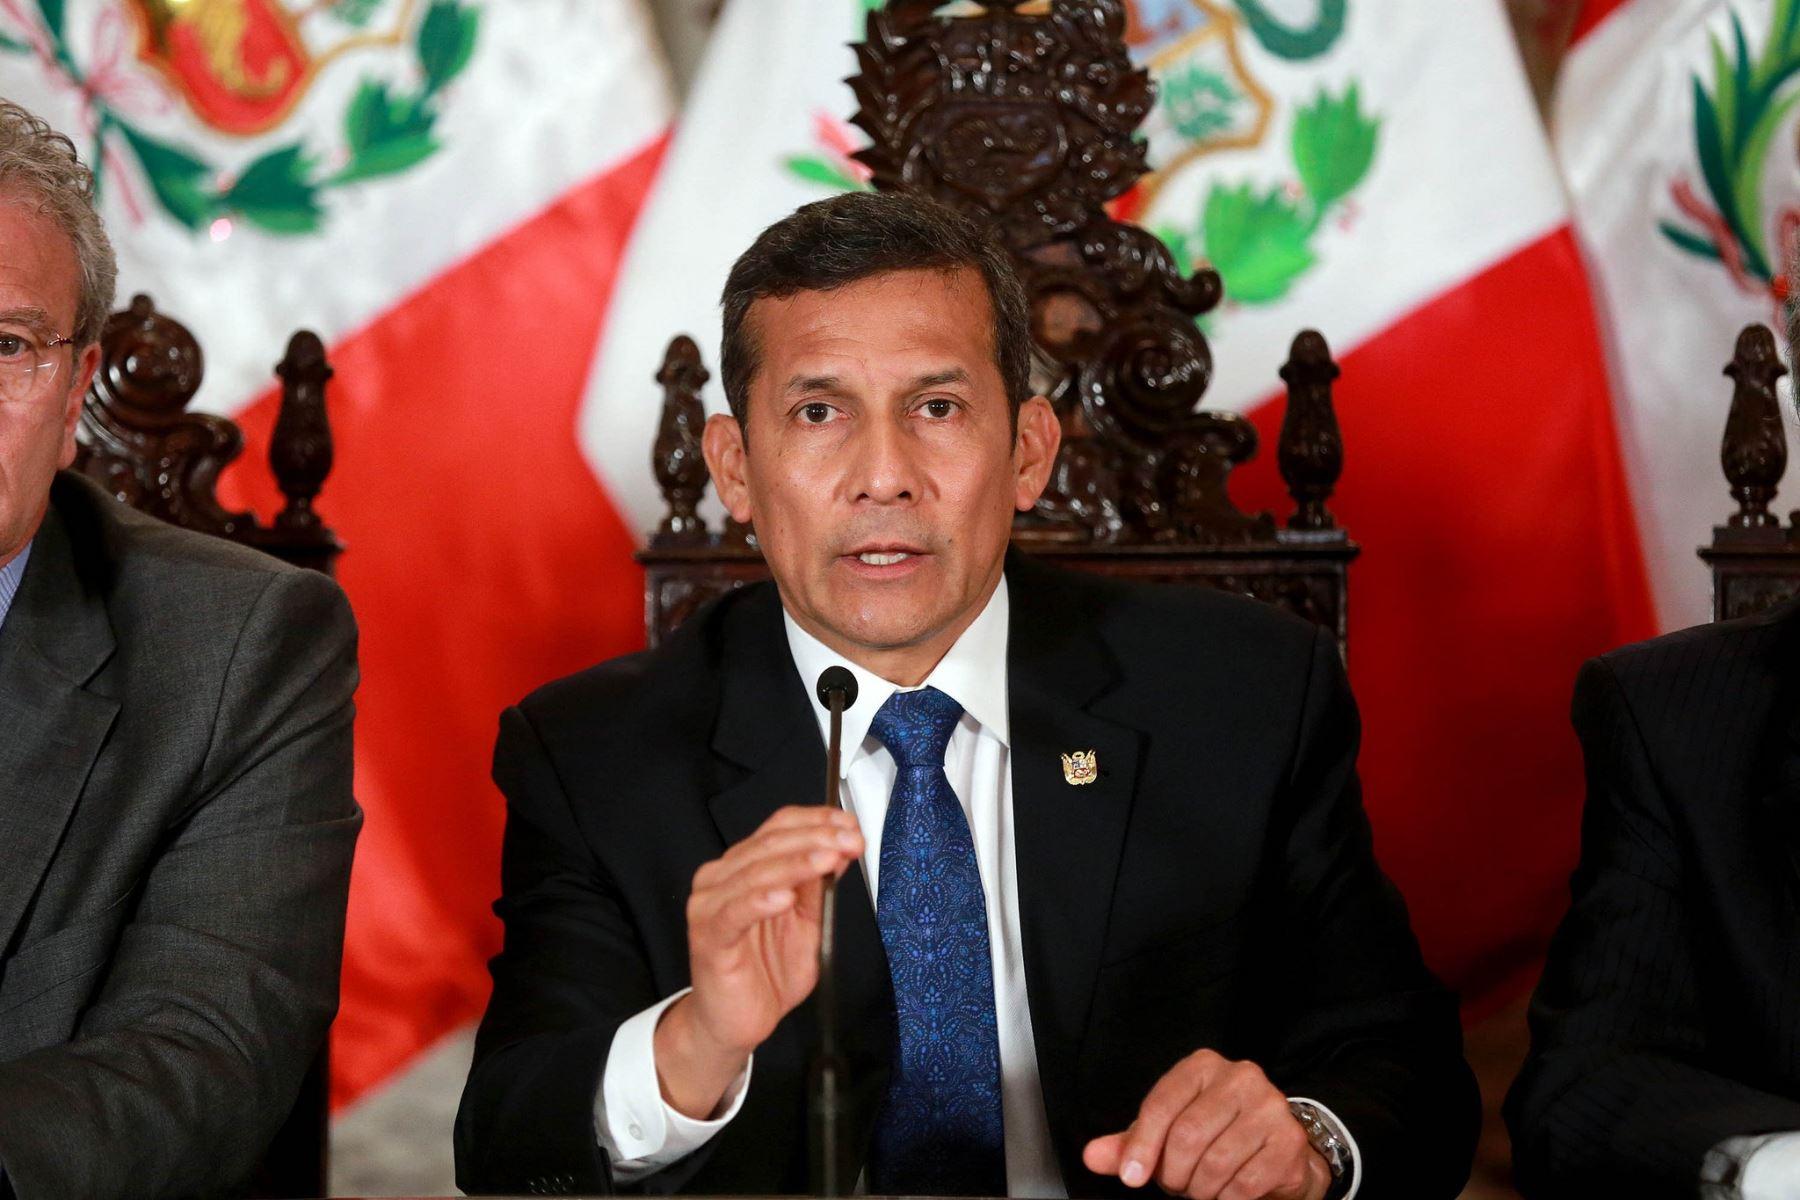 Presidente de la República, Ollanta Humala Tasso.